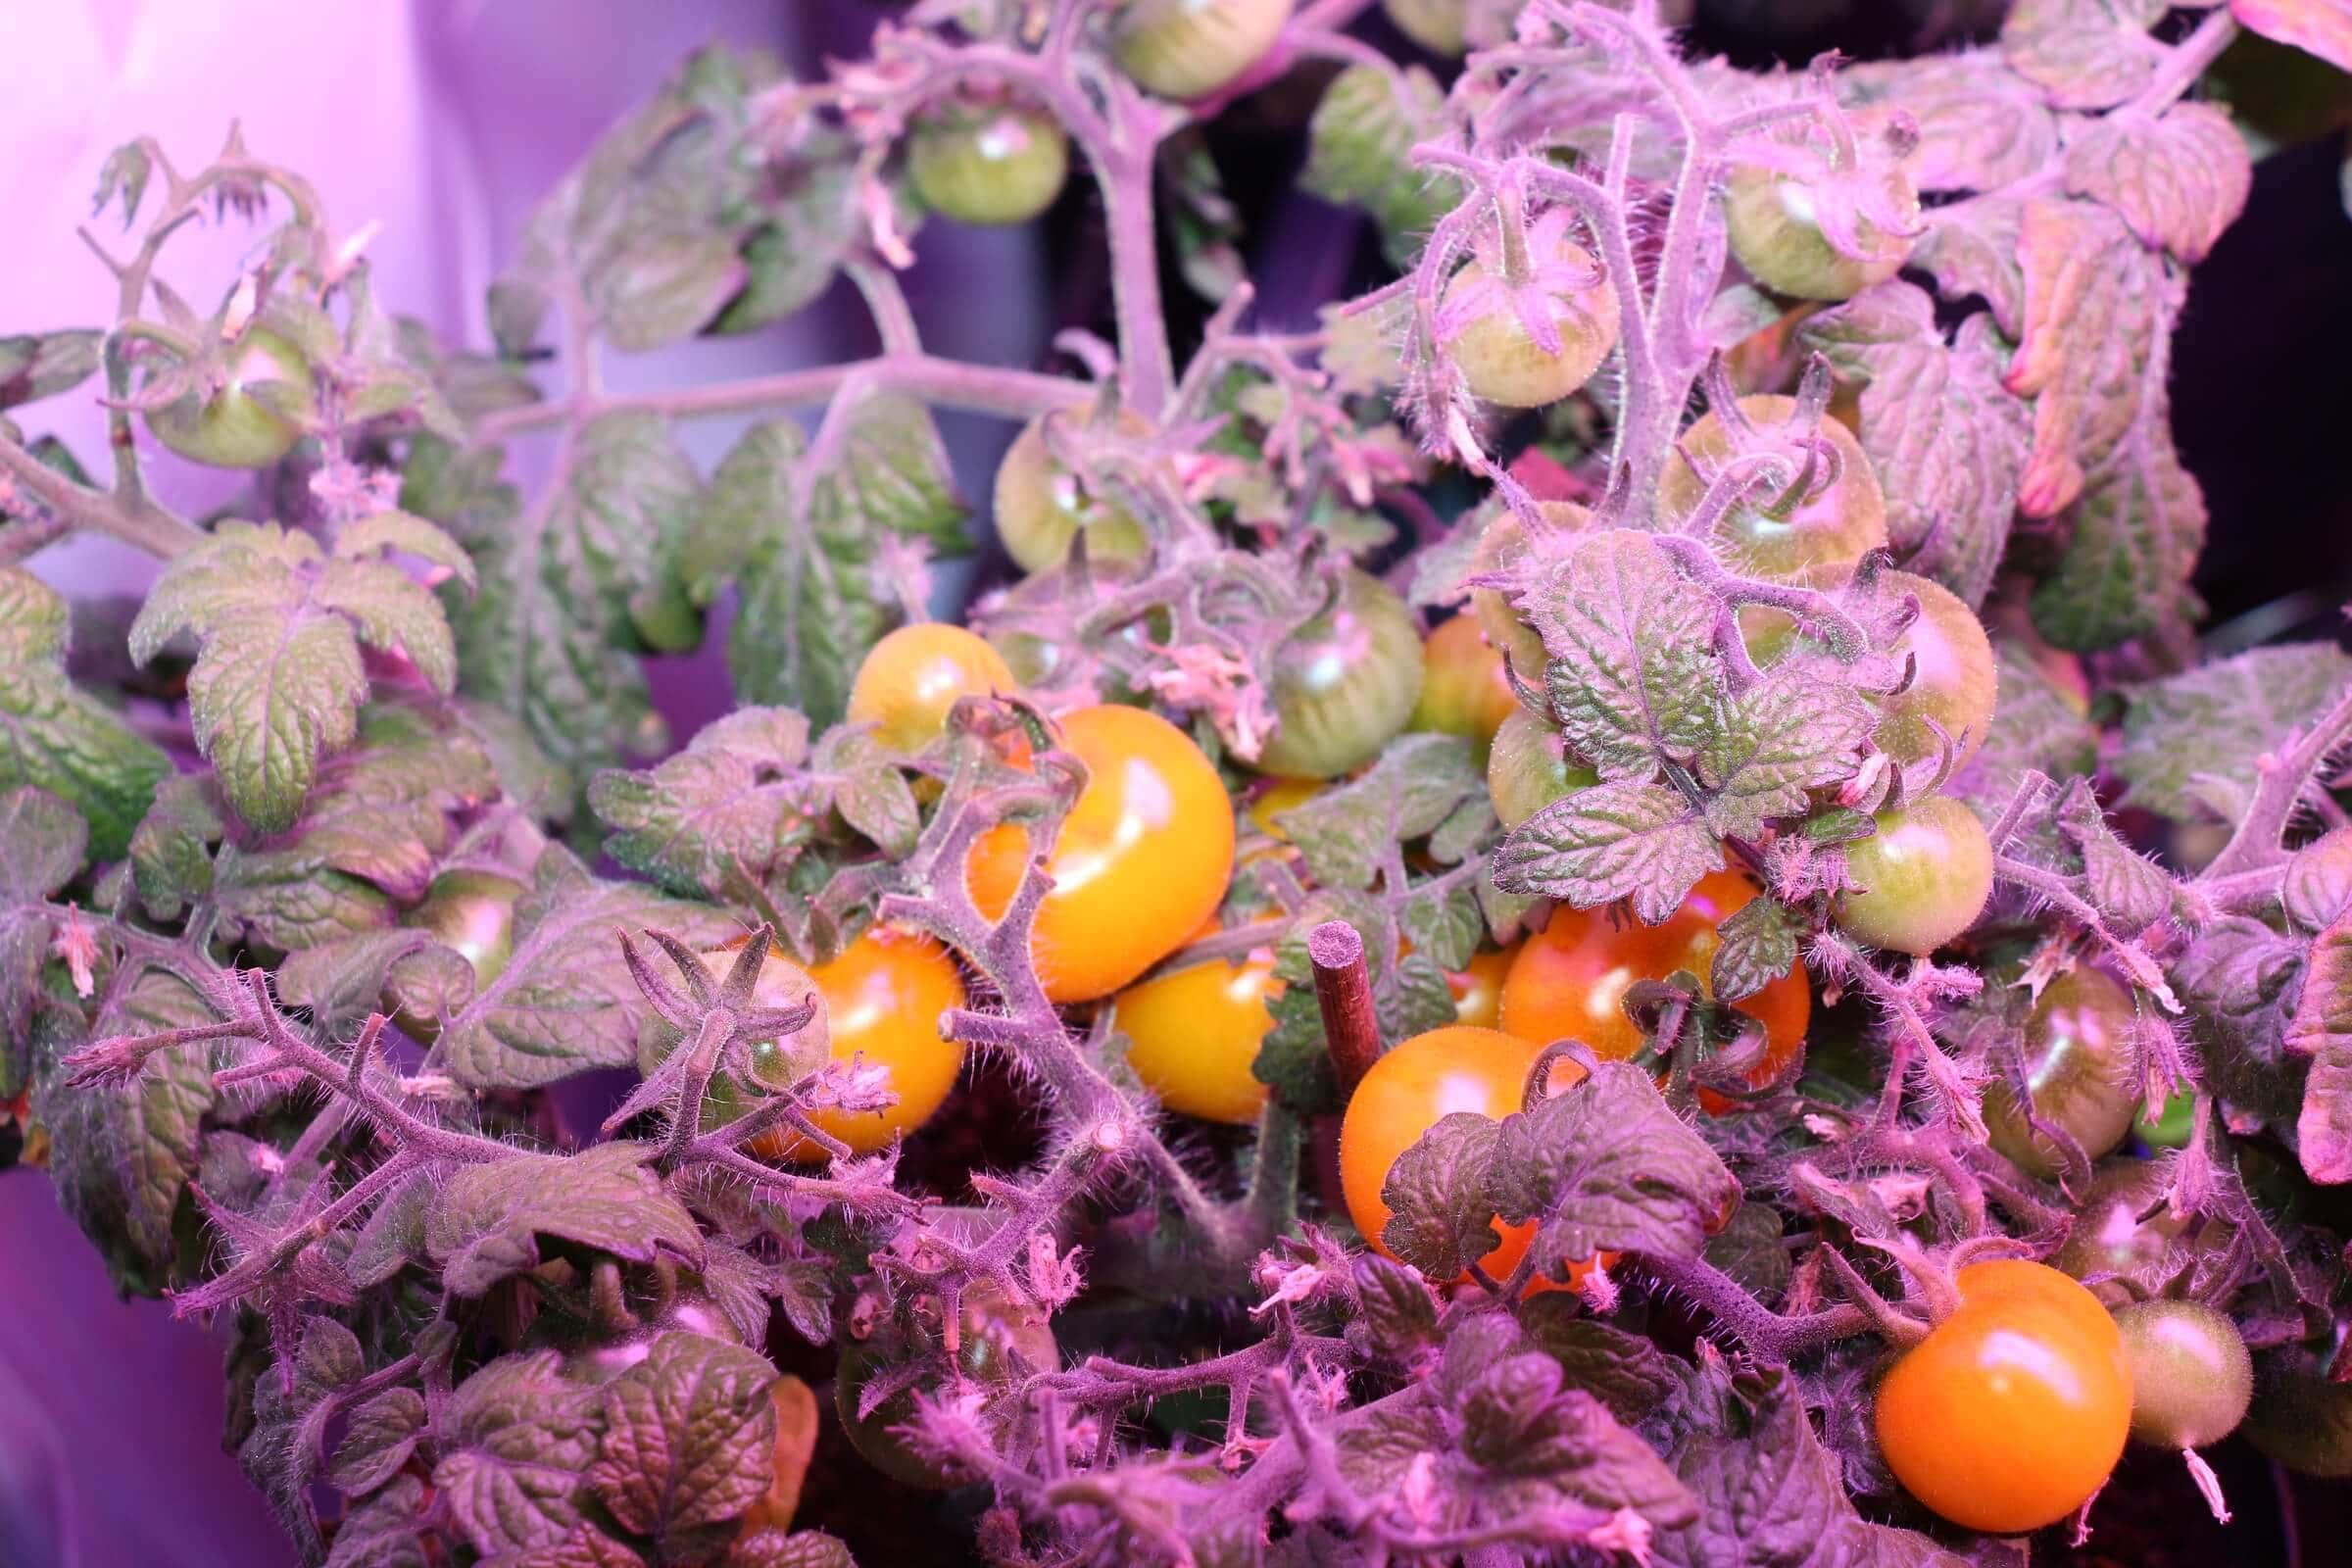 Eine andere Tomatenpflanze